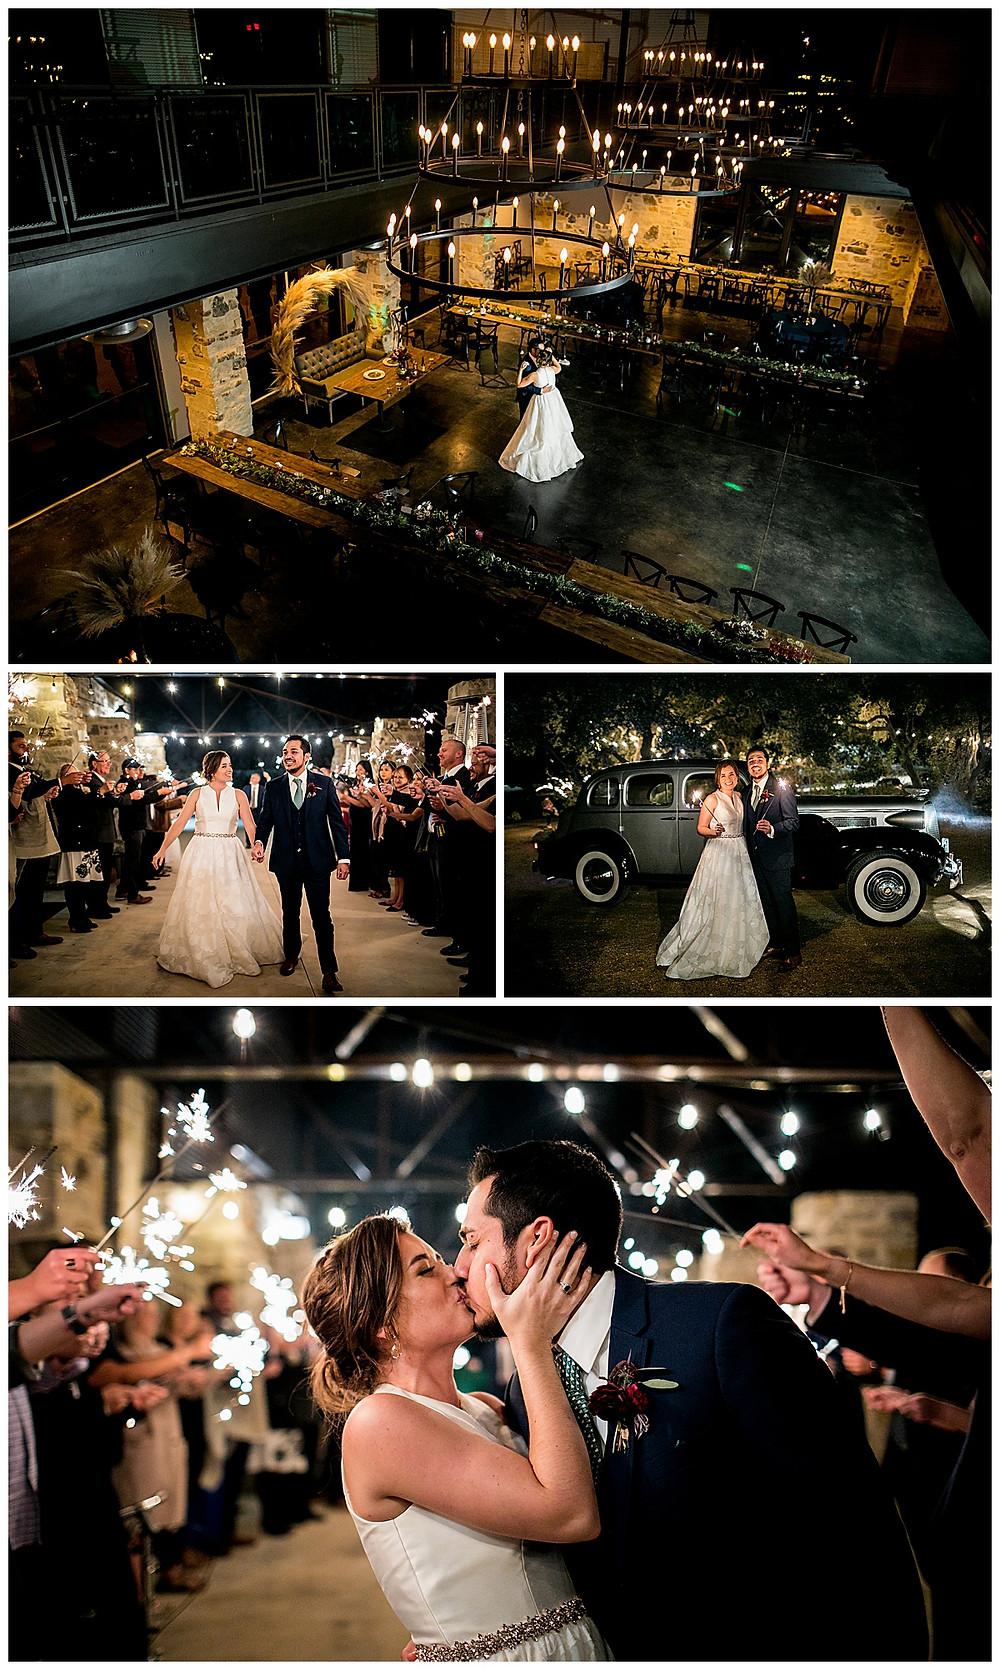 bride and groom final dance and sparkler send off